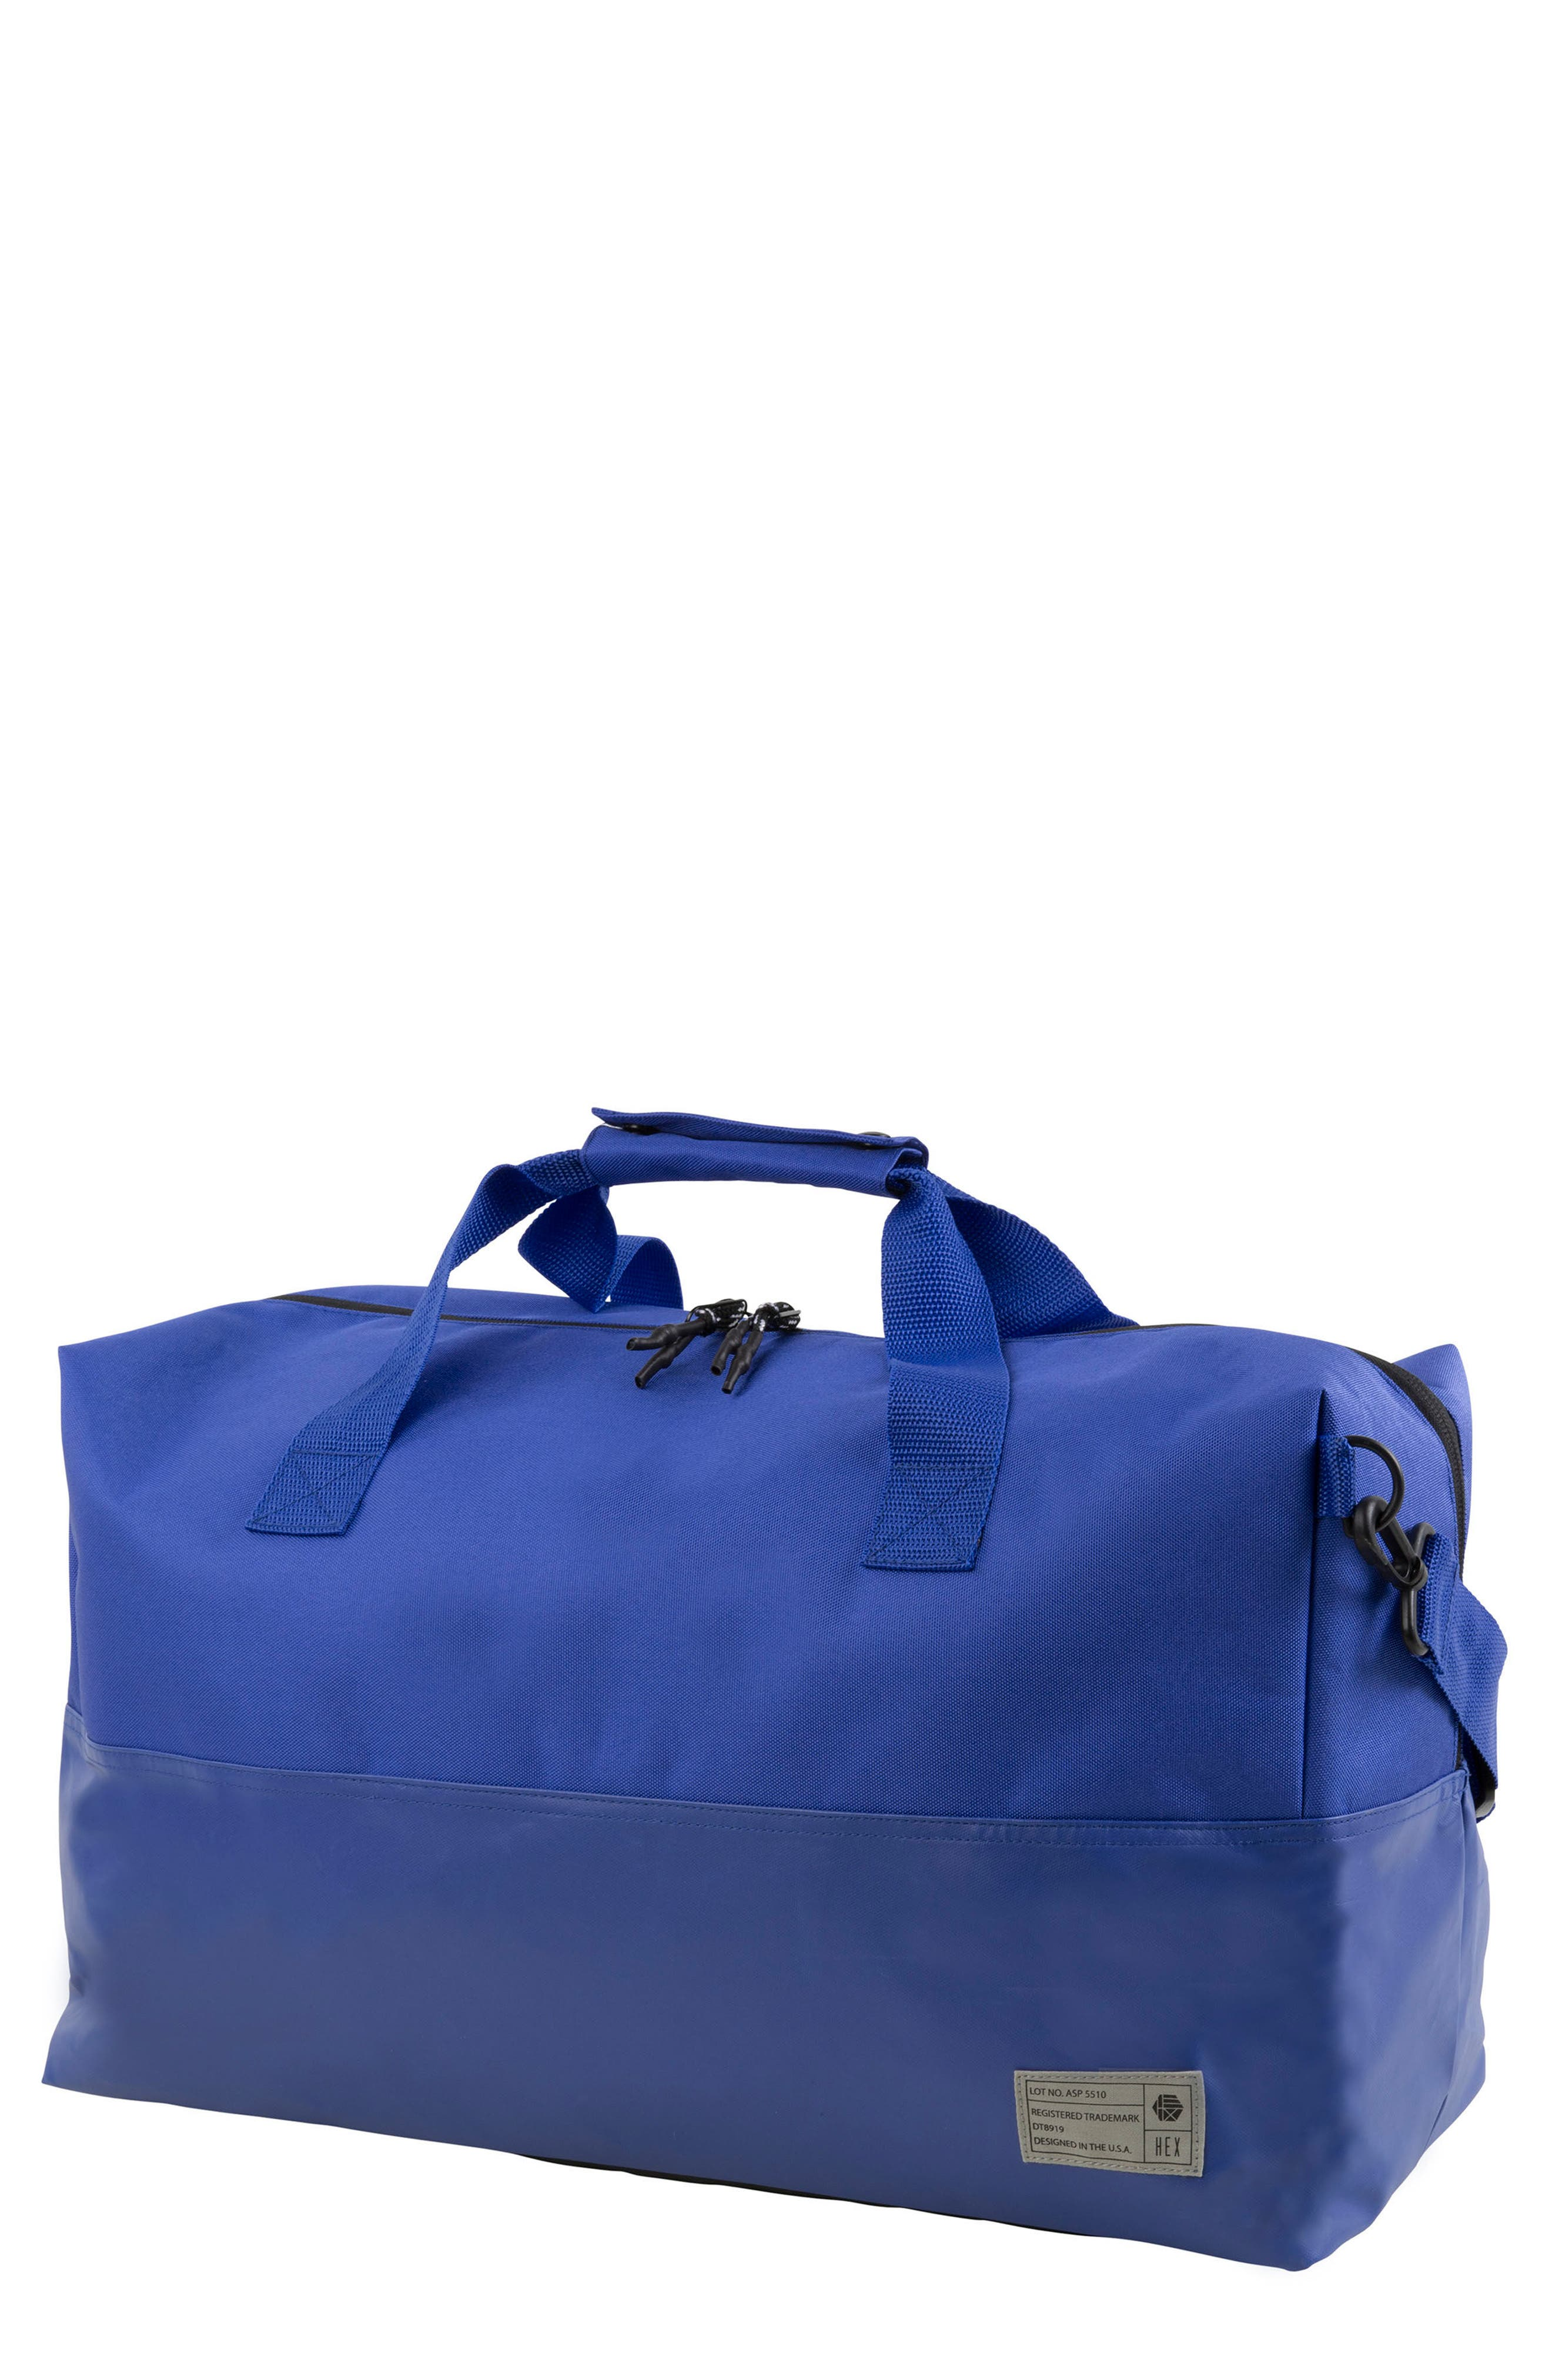 Main Image - HEX Aspect Duffel Bag